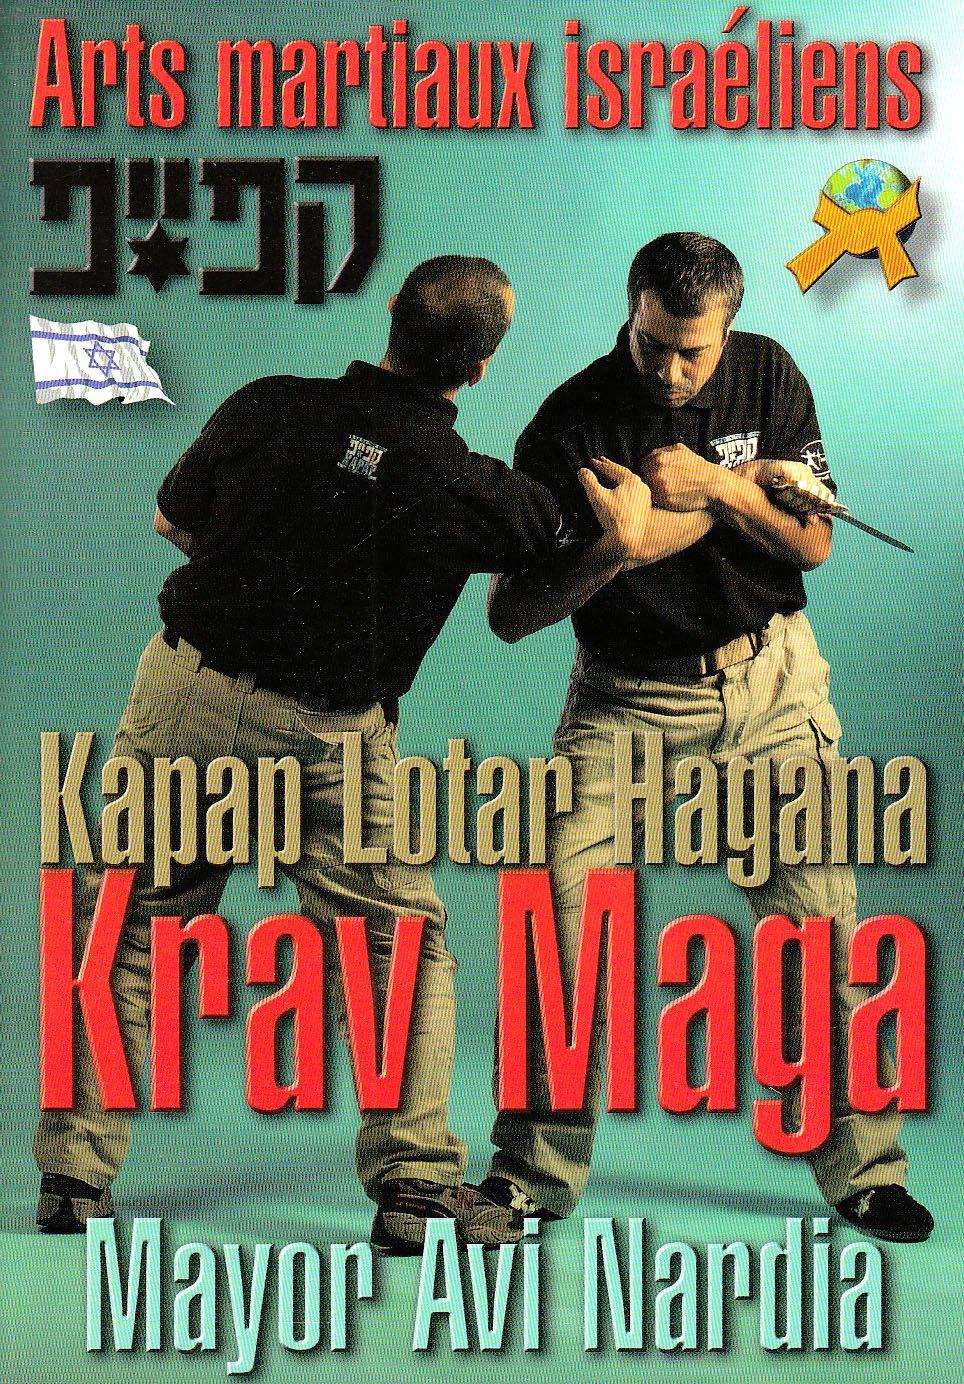 Arts Martiaux Israeliens Krav Maga Amazon Fr Nardia Avi Livres